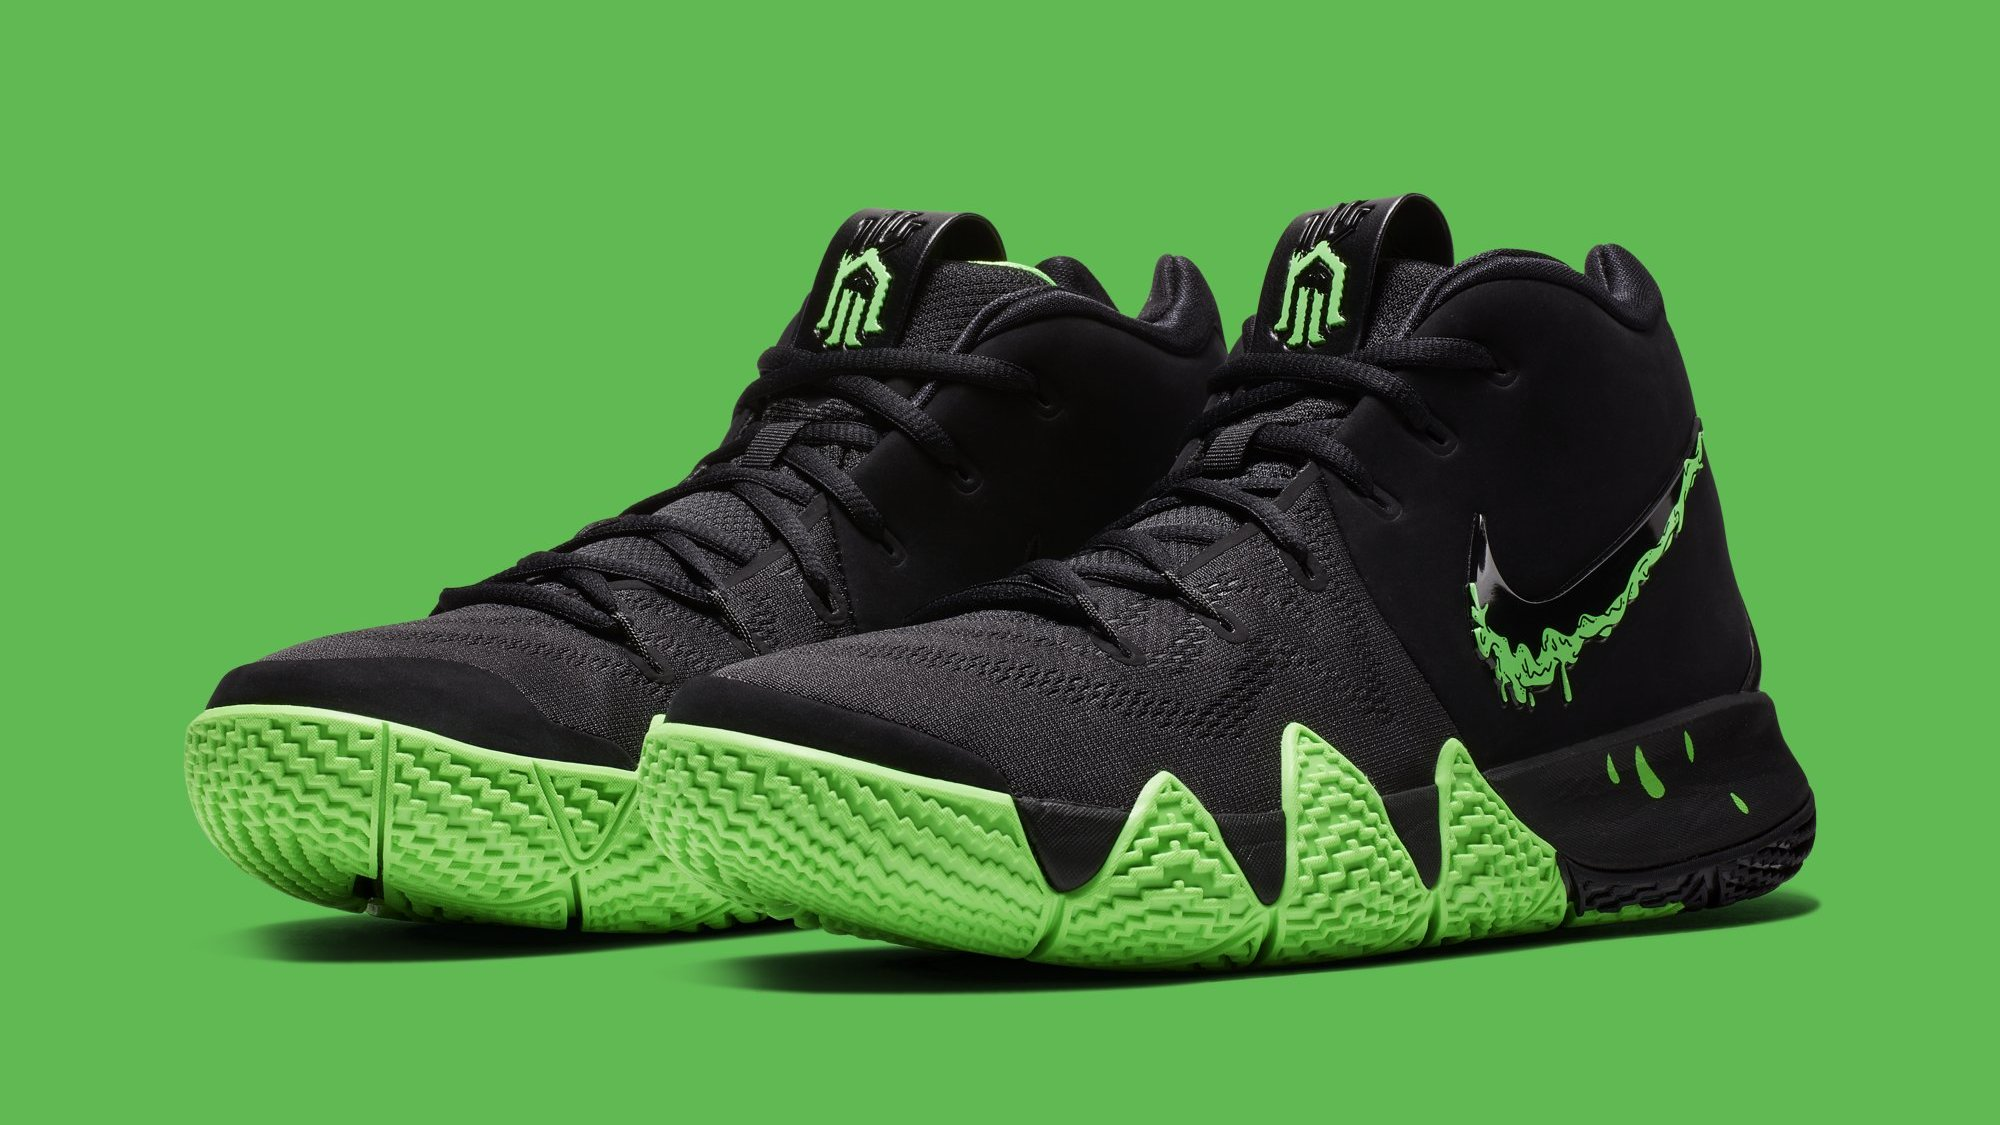 6aa22f2a2572 Nike Kyrie 4 Black Rage Green Halloween Release Date 943806-012 ...